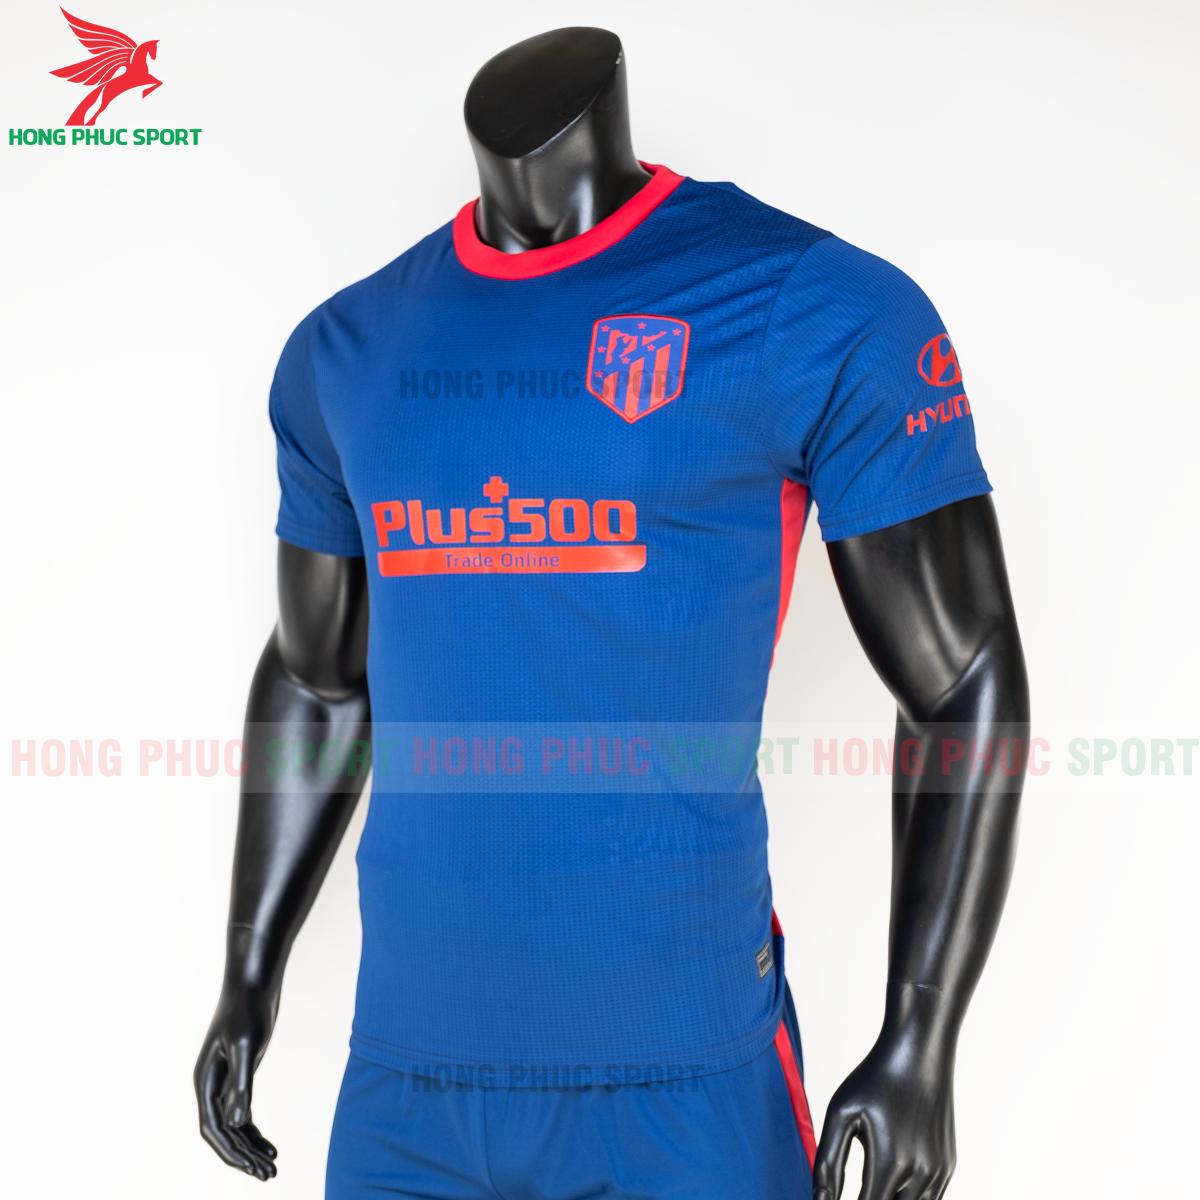 https://cdn.hongphucsport.com/unsafe/s4.shopbay.vn/files/285/ao-bong-da-atletico-madrid-20-21-san-khach-hang-thailand-3-5fae46477ee0e.png